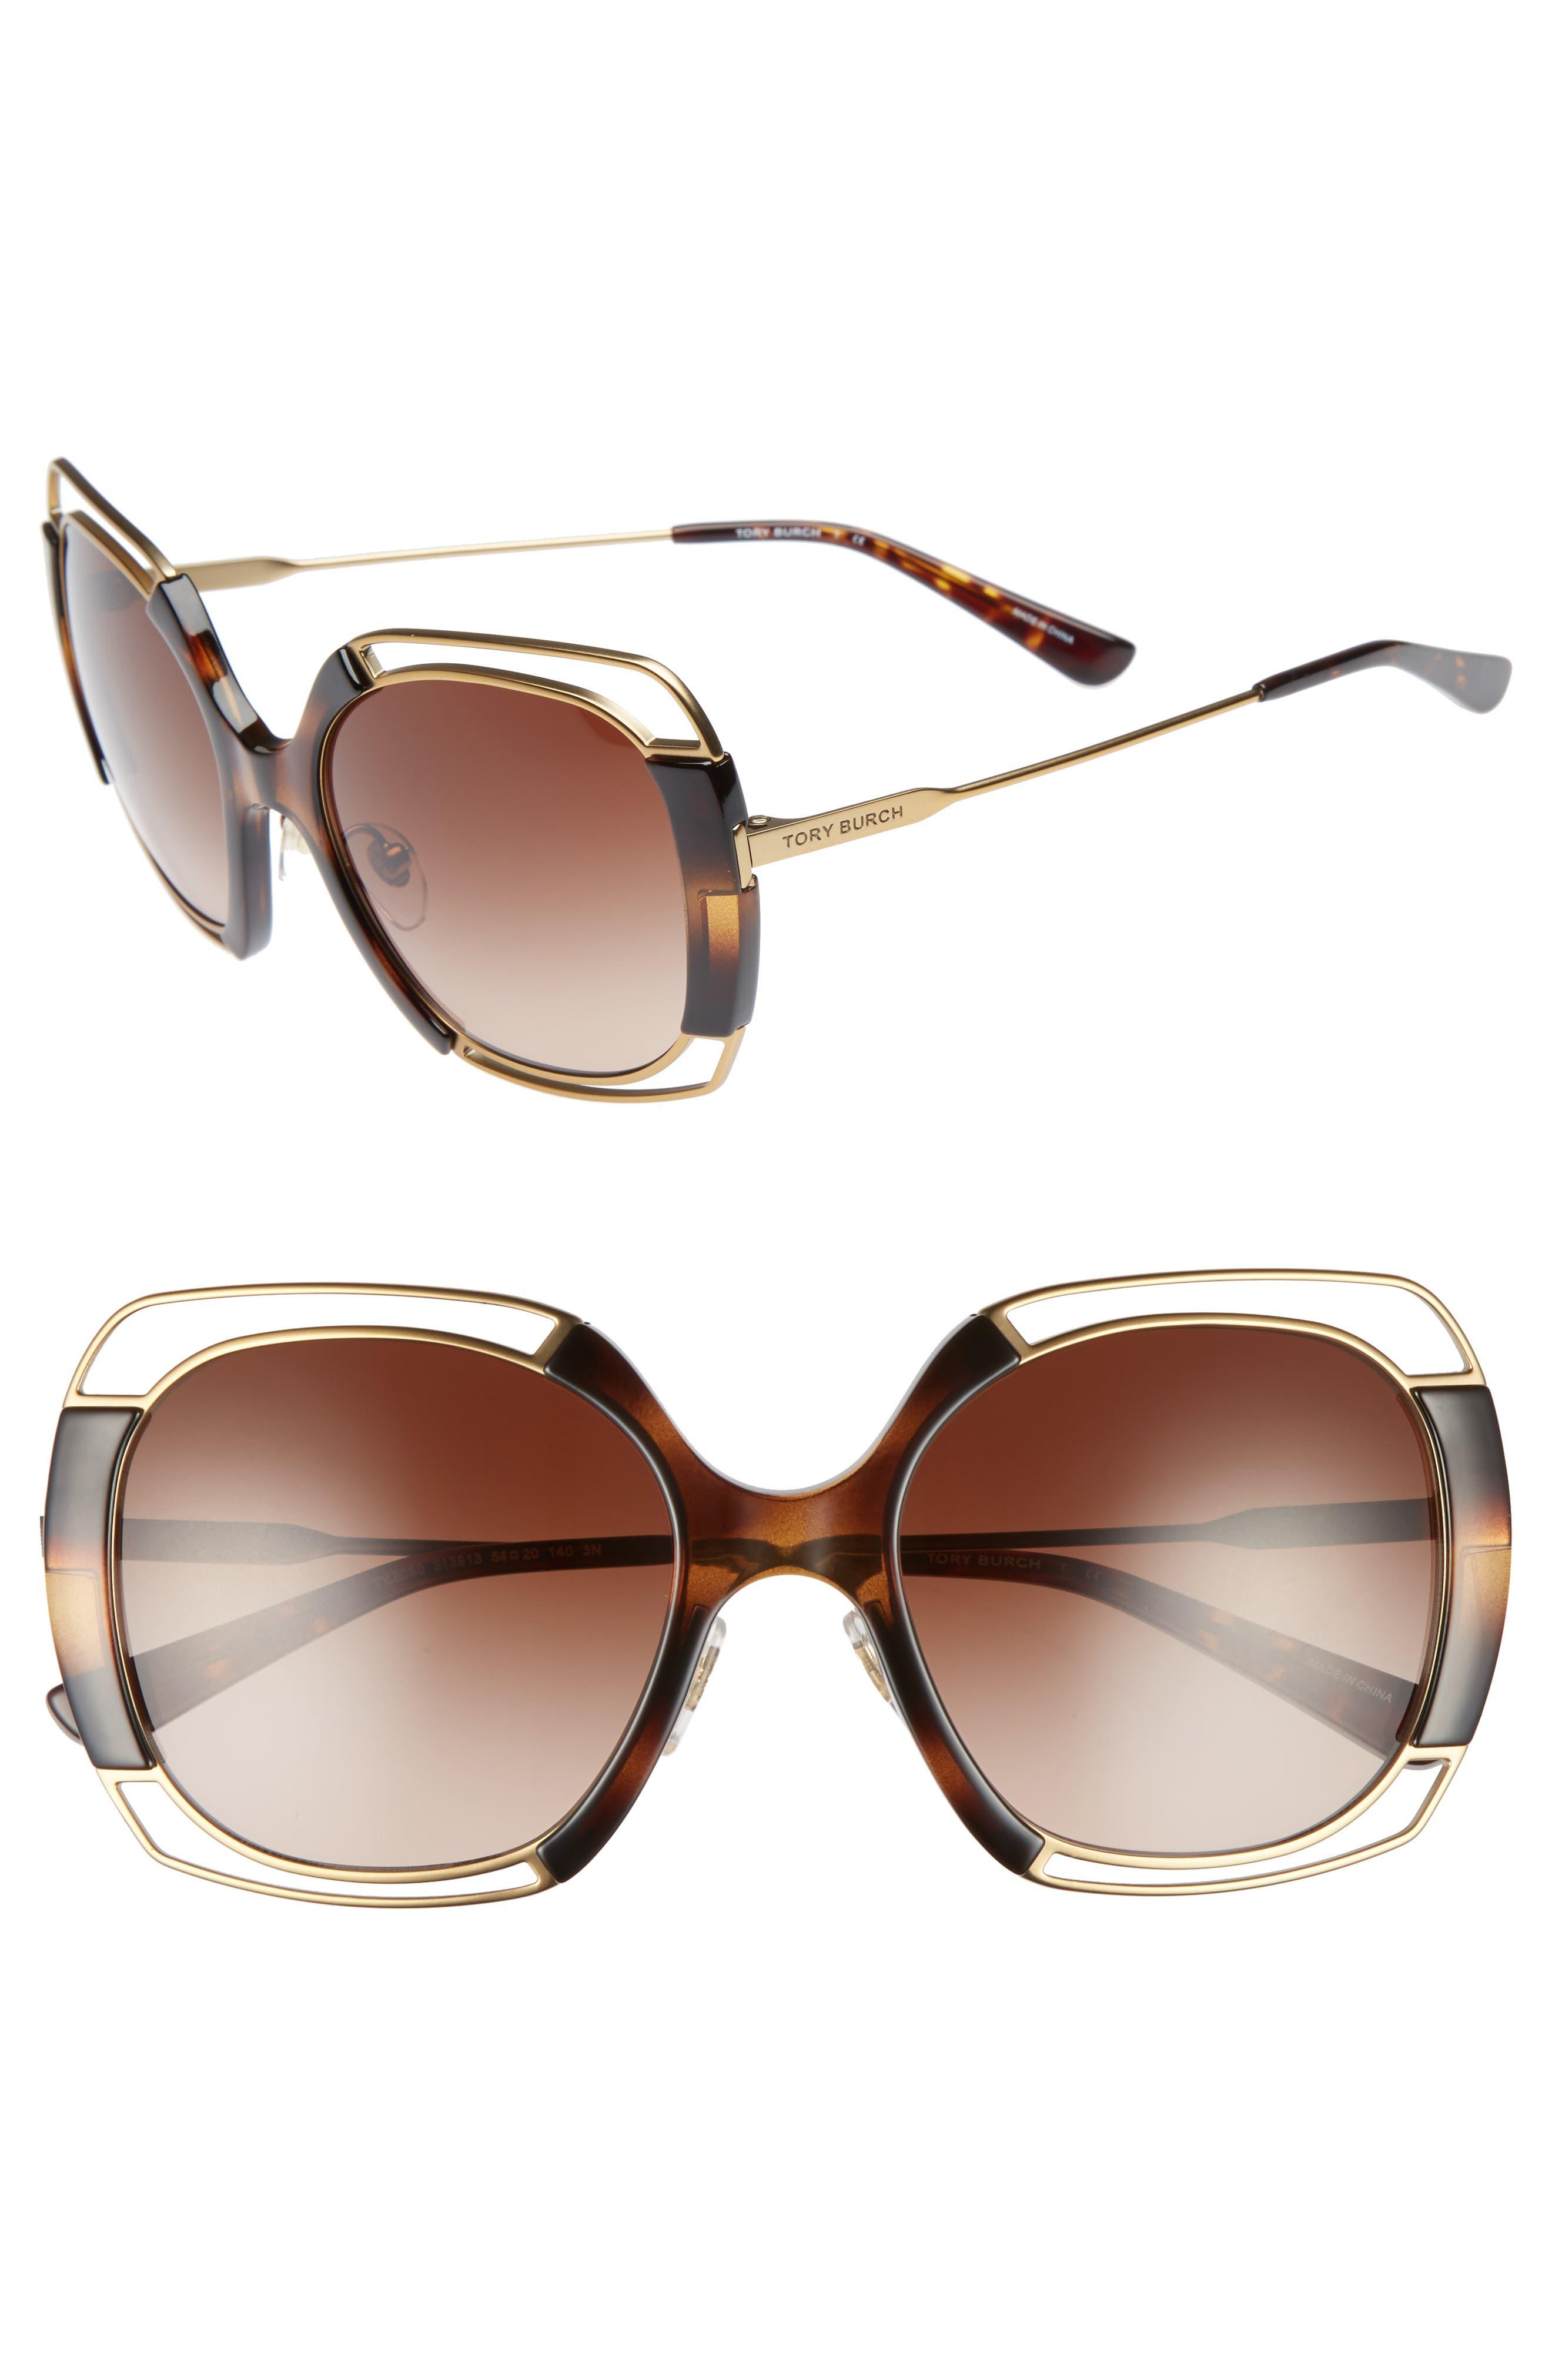 Tory Burch 54mm Square Gradient Sunglasses